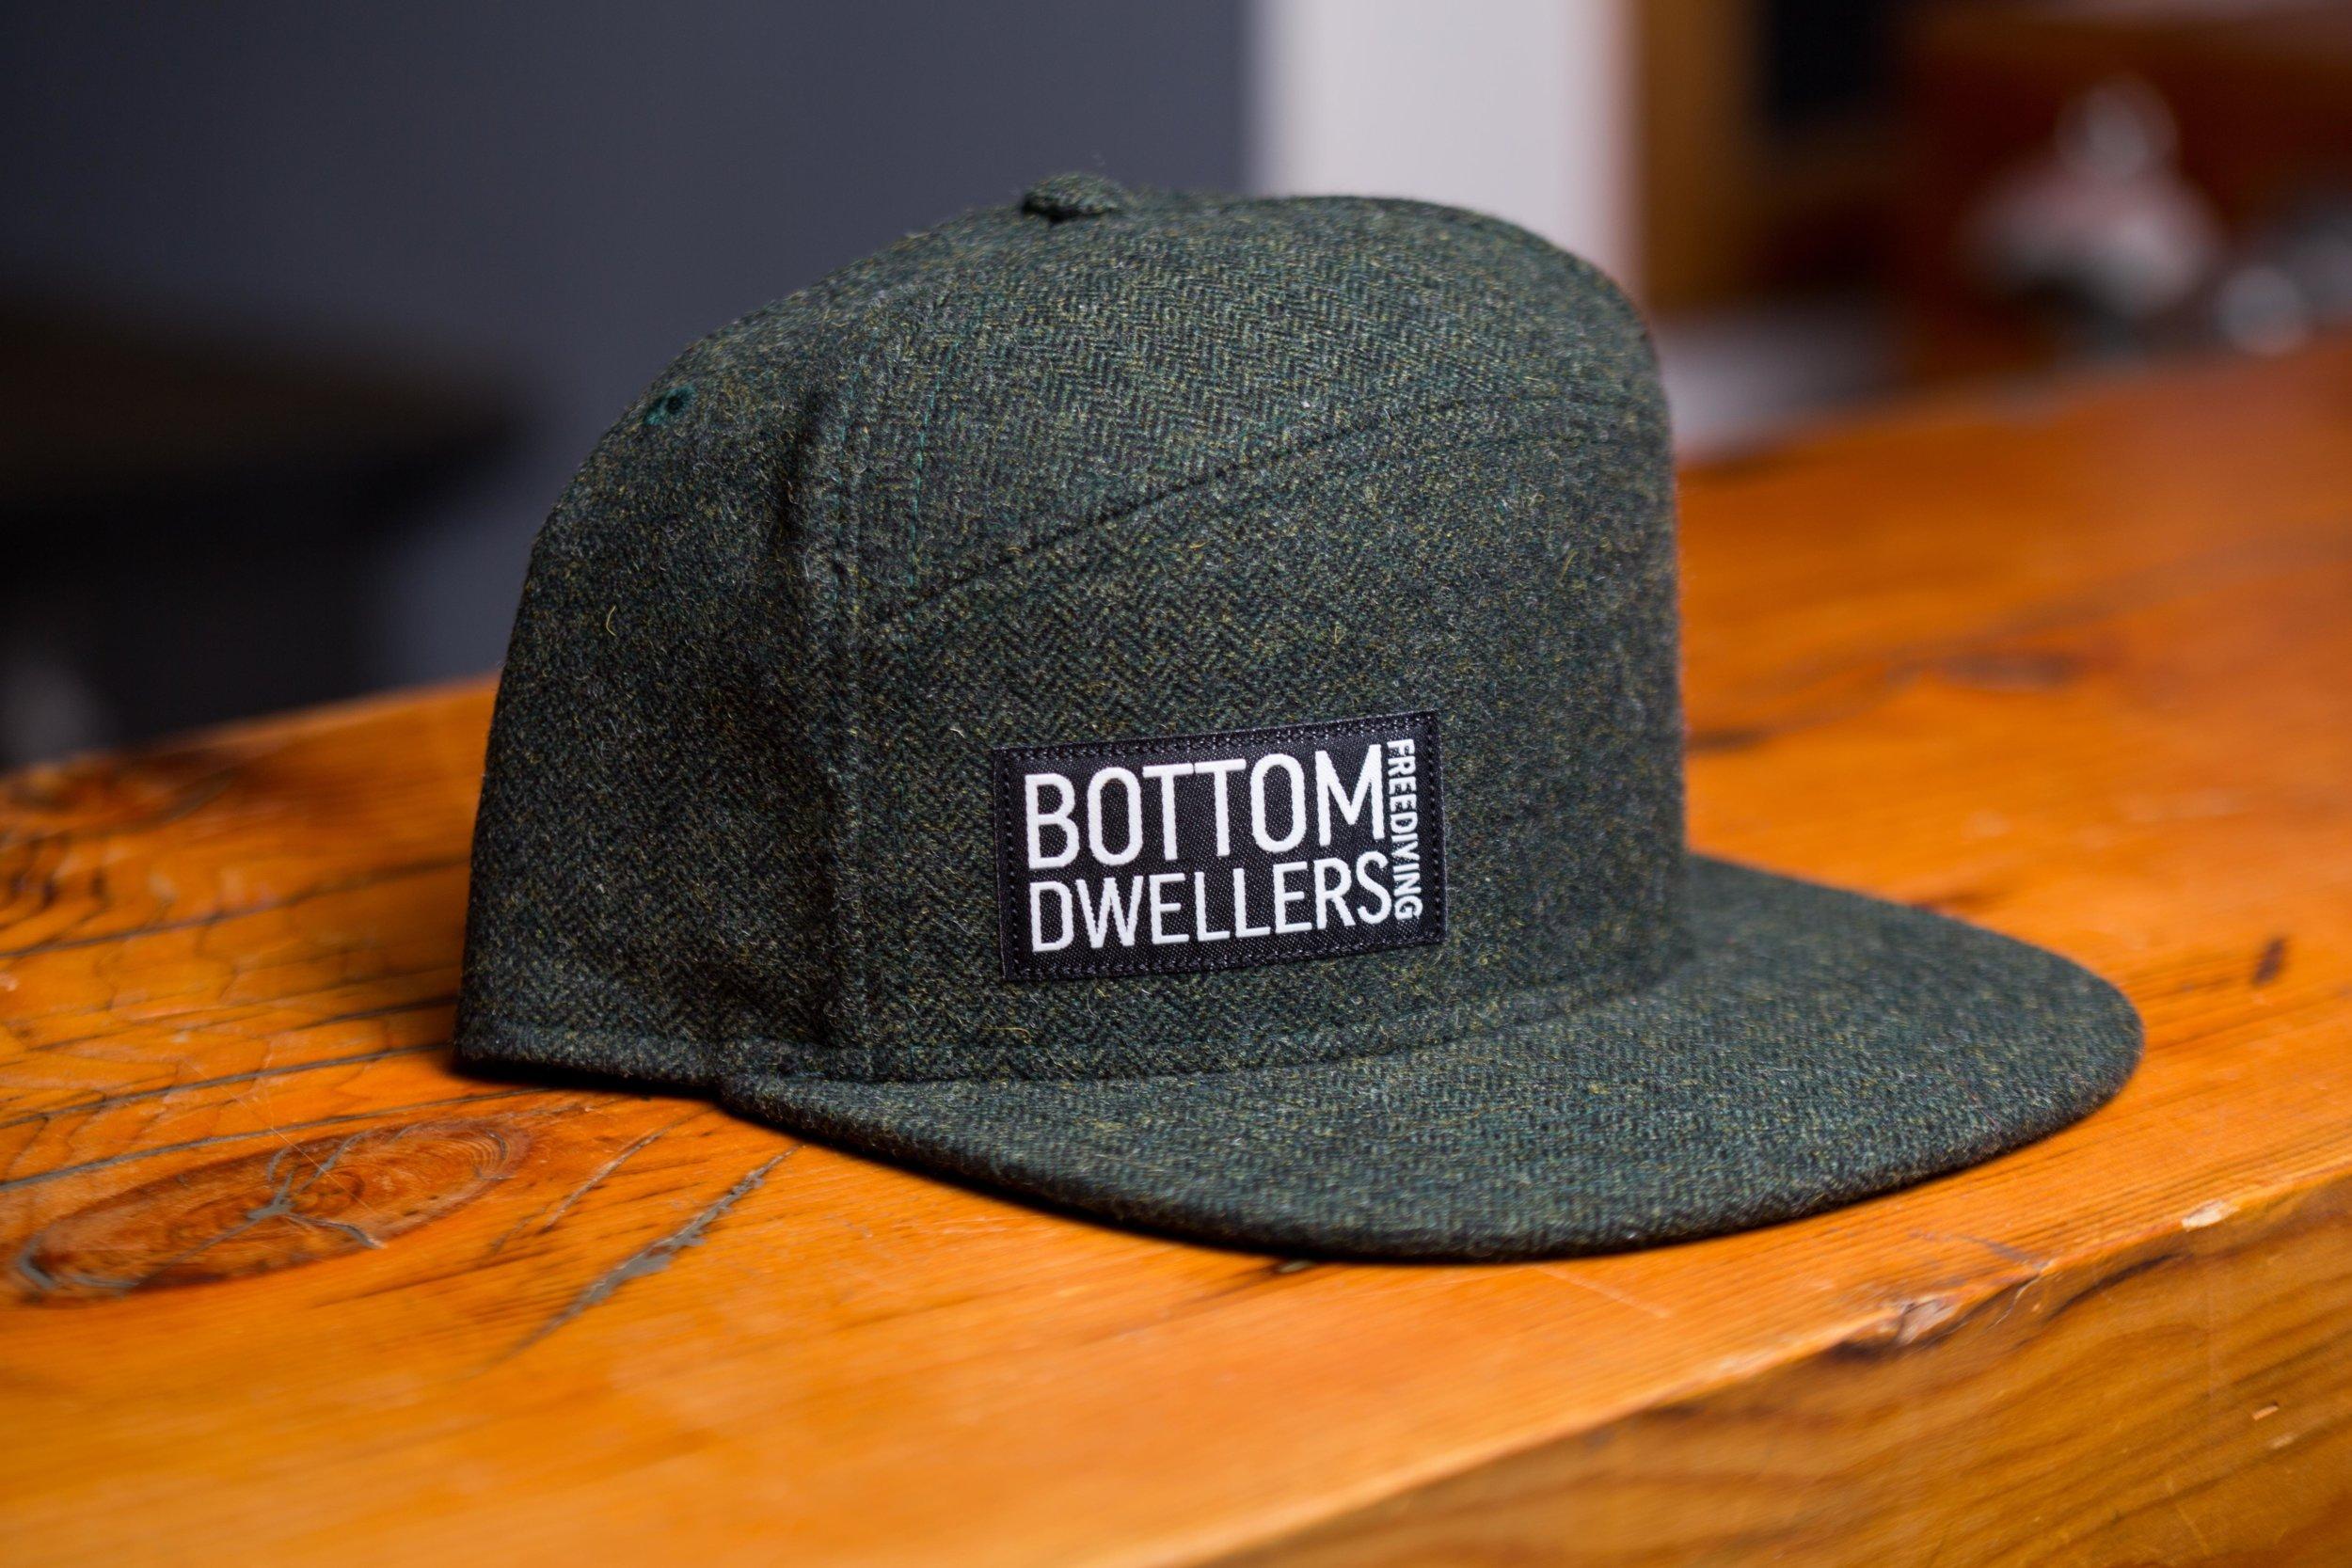 BOTTOM_DWELLERS_WEB_RESOLUTION-87.jpeg